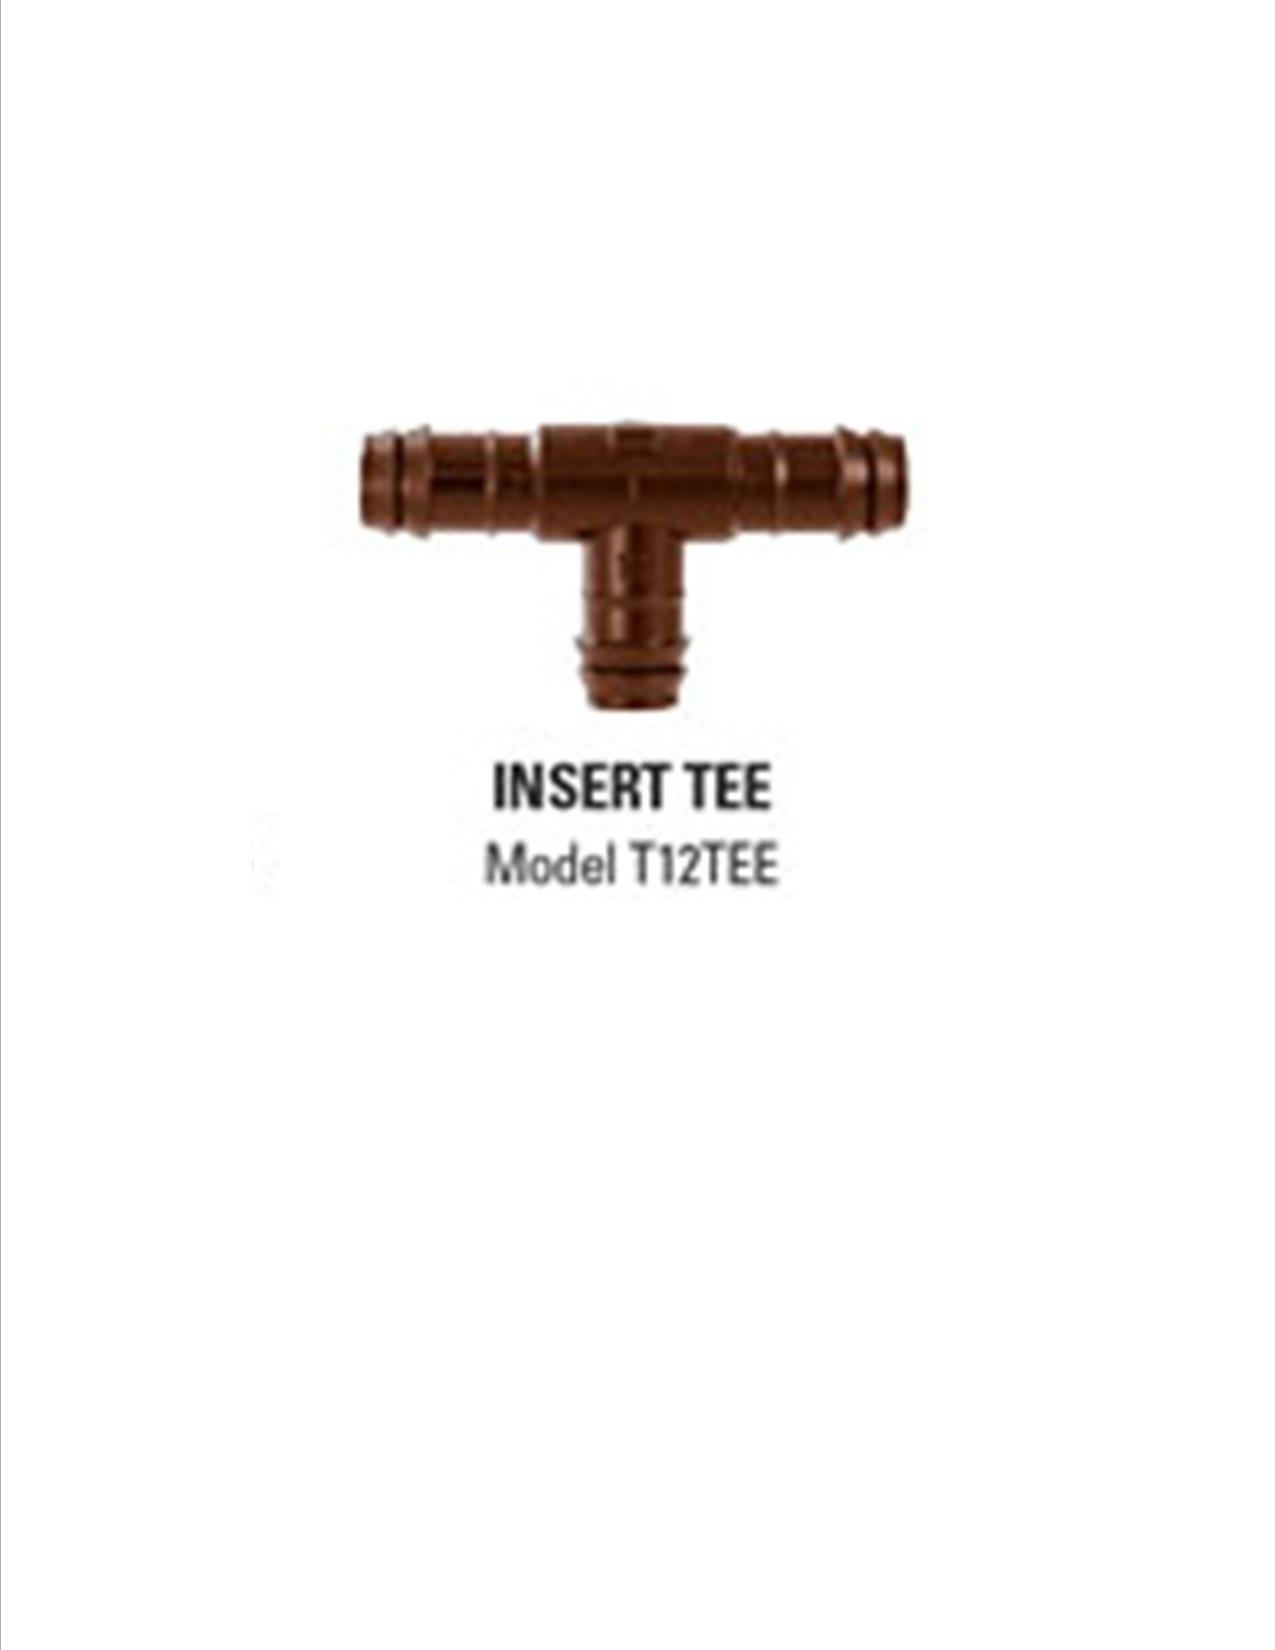 12mm Insert Tee - 10 per package by Netafim